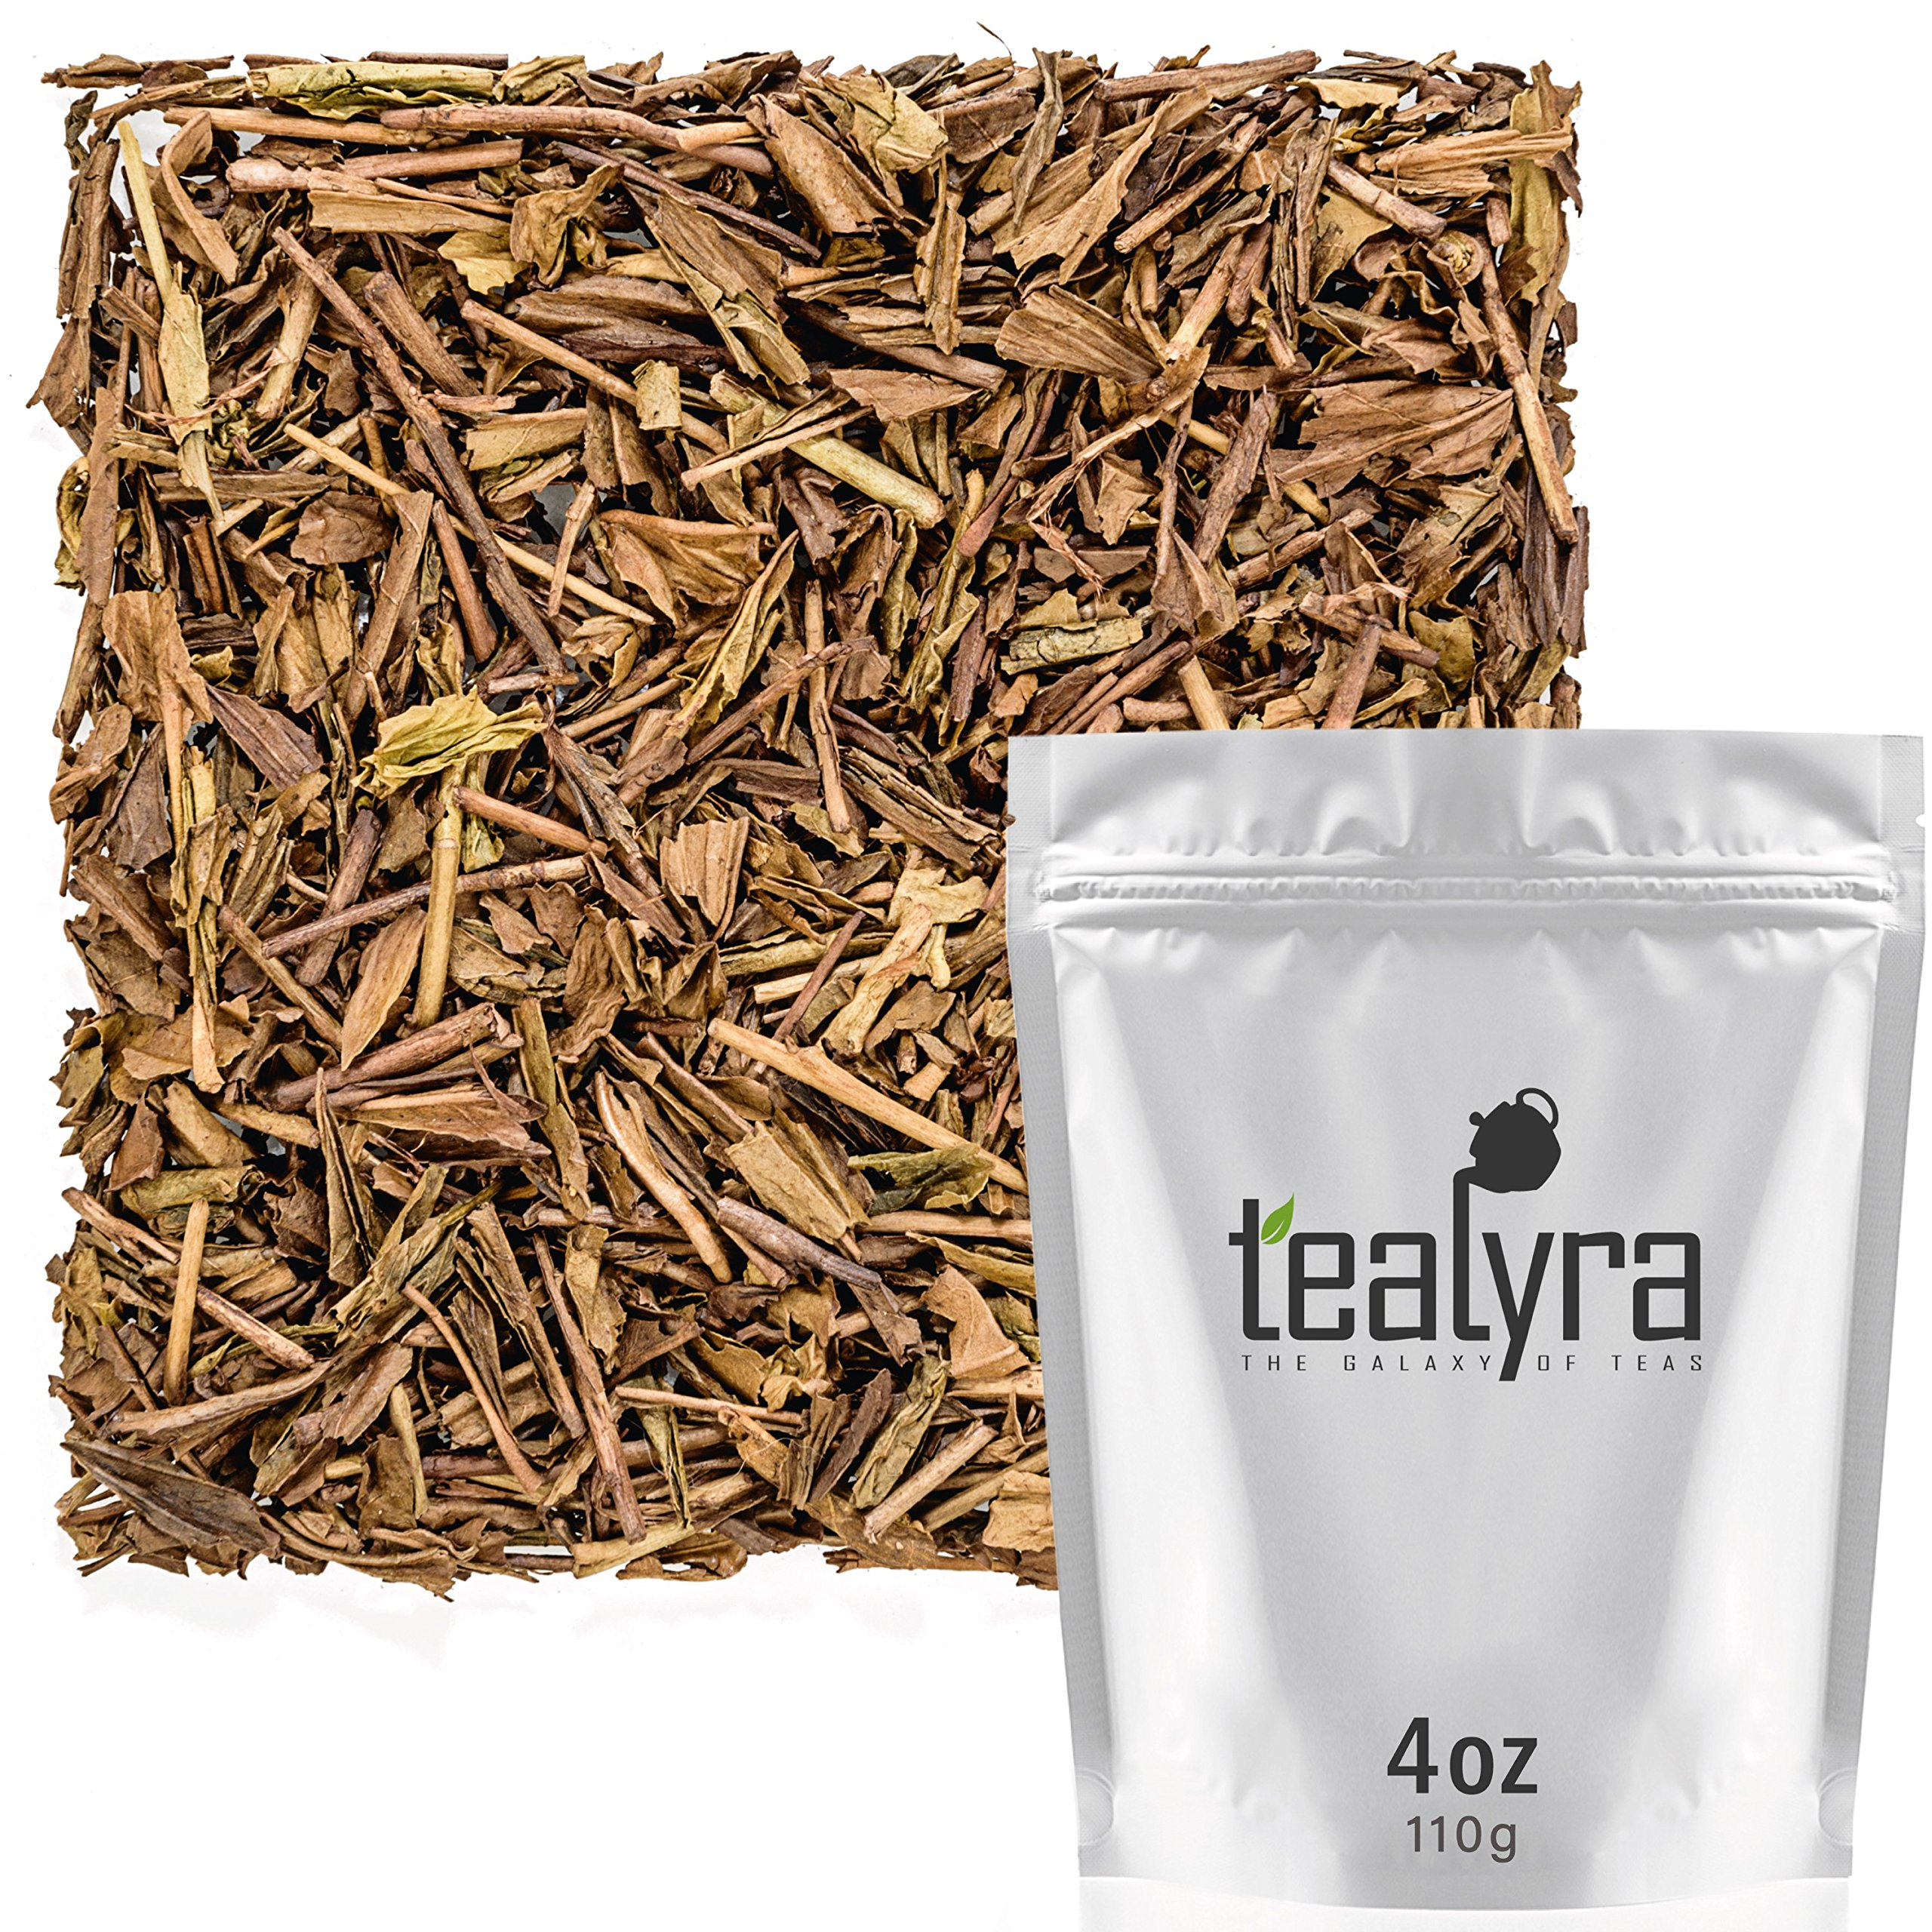 Tealyra - Hojicha Roasted Green Tea - Japanese Loose Leaf Tea - High Antioxidants - Low Caffeine - 110g (4-ounce)